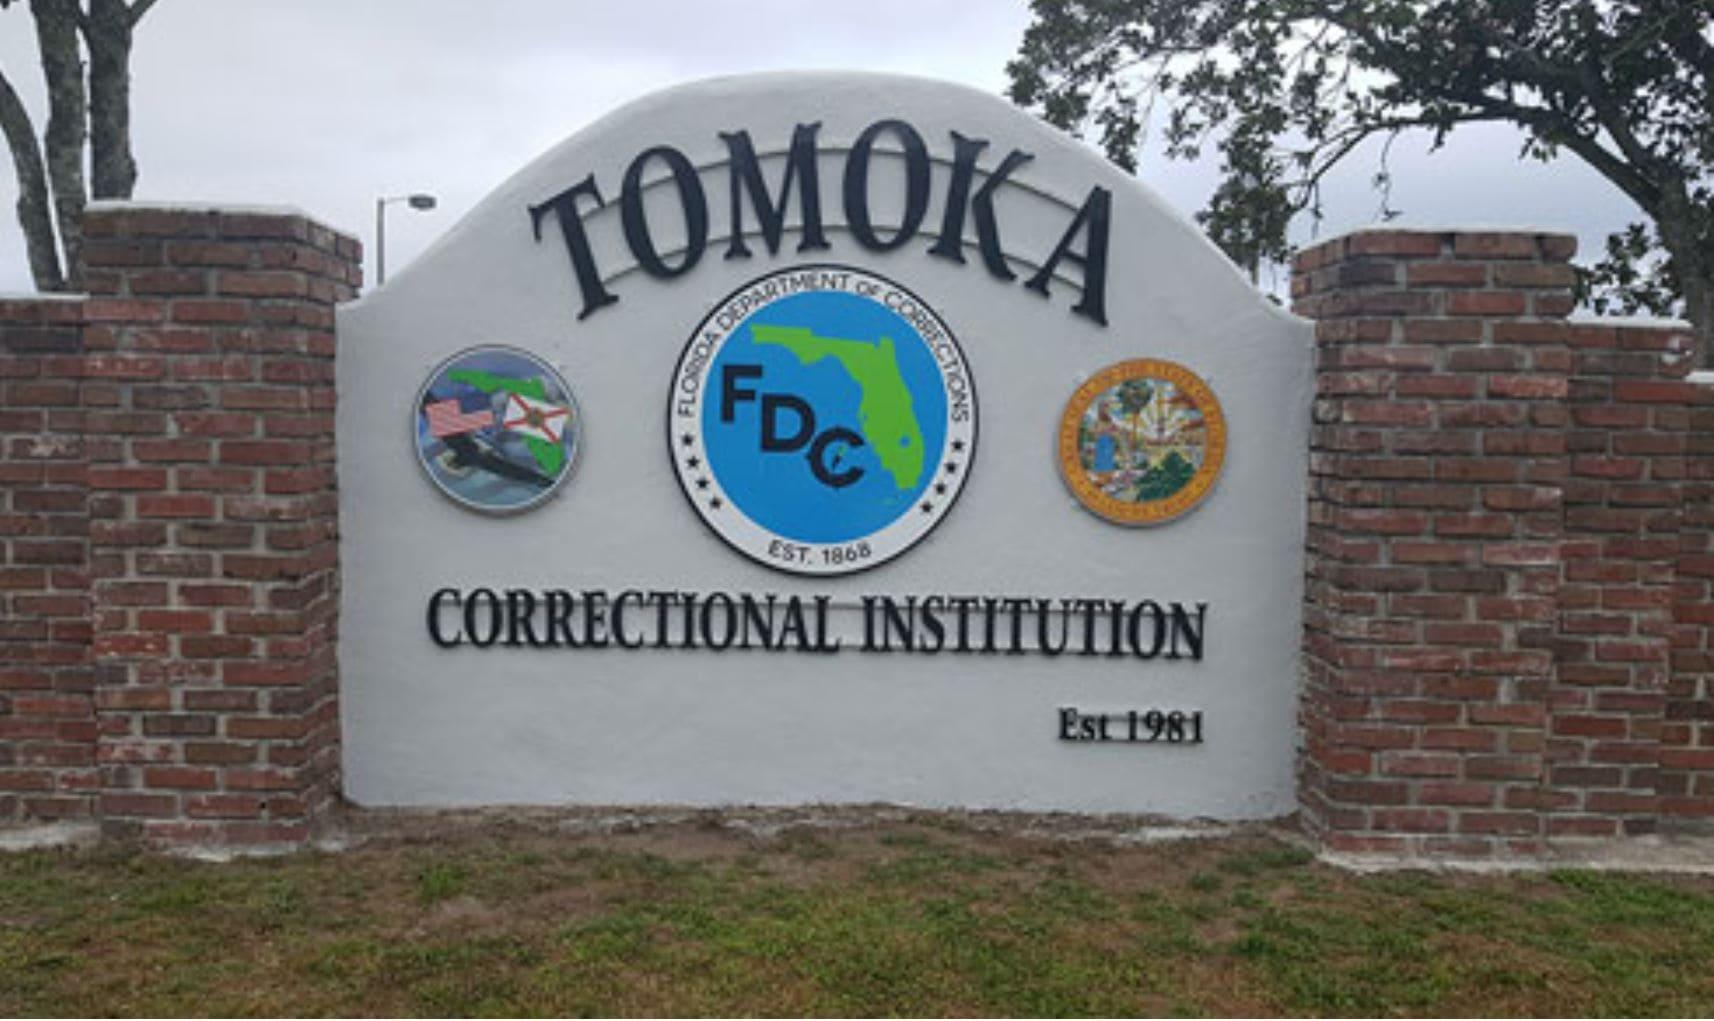 Tomoka Correctional Institution DOC Prison Jail